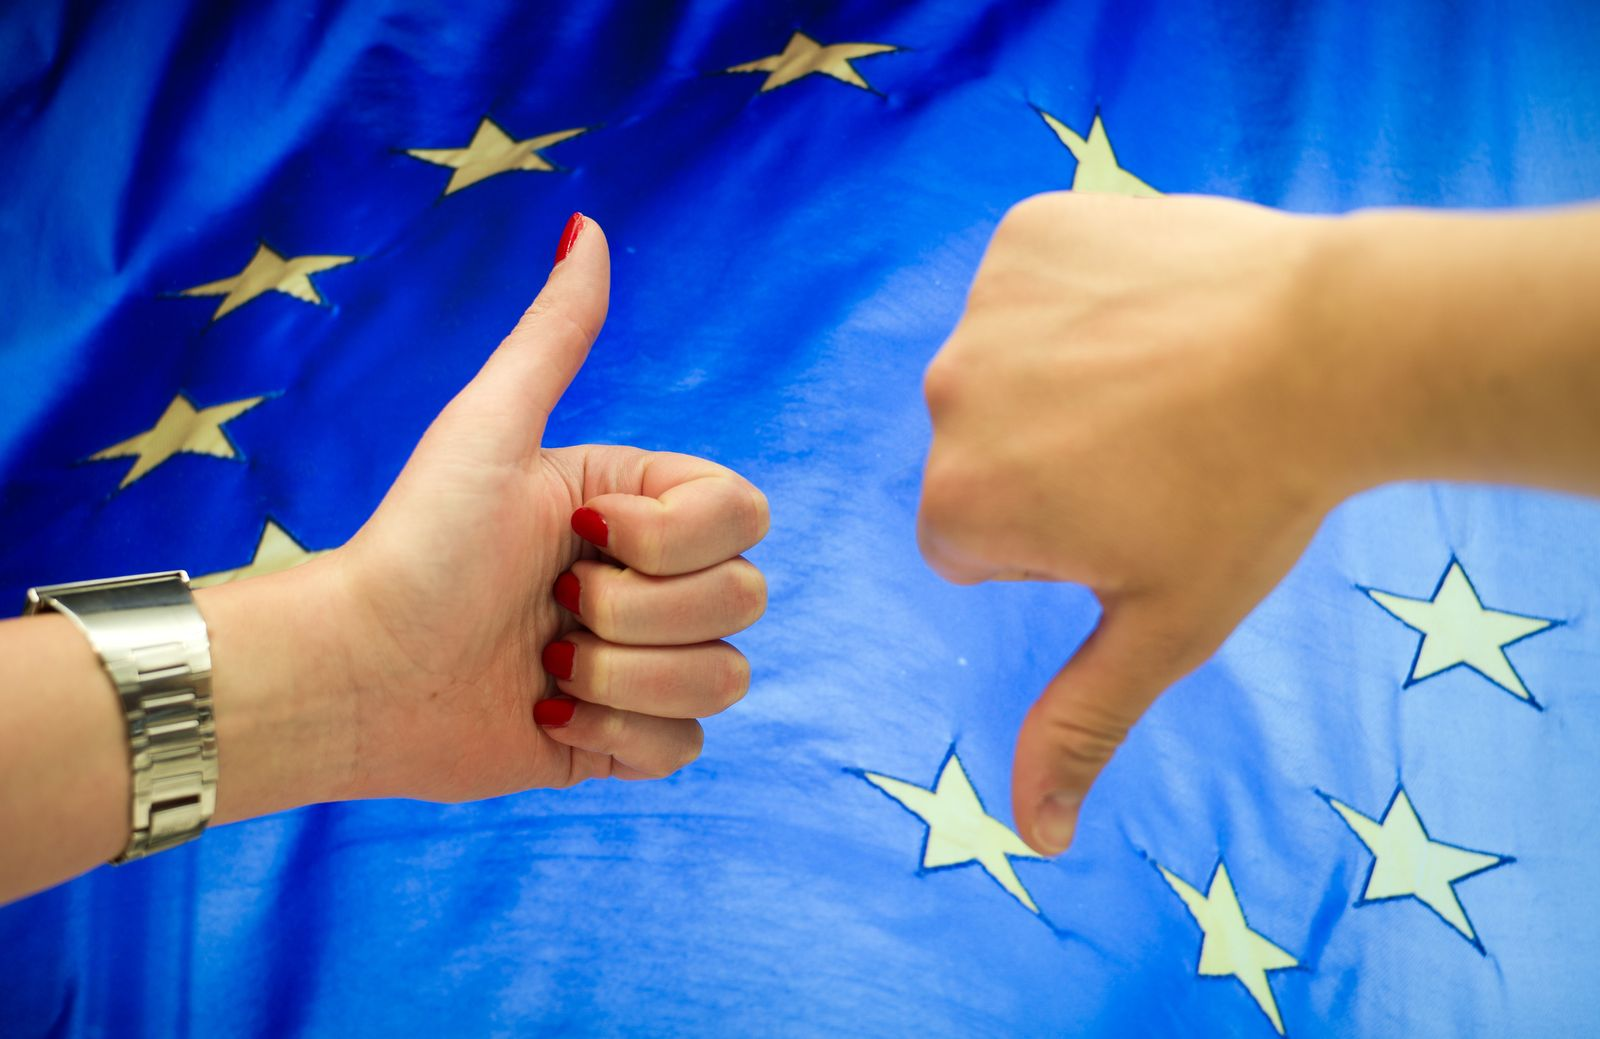 Europa-Flagge - Thumbs up / down